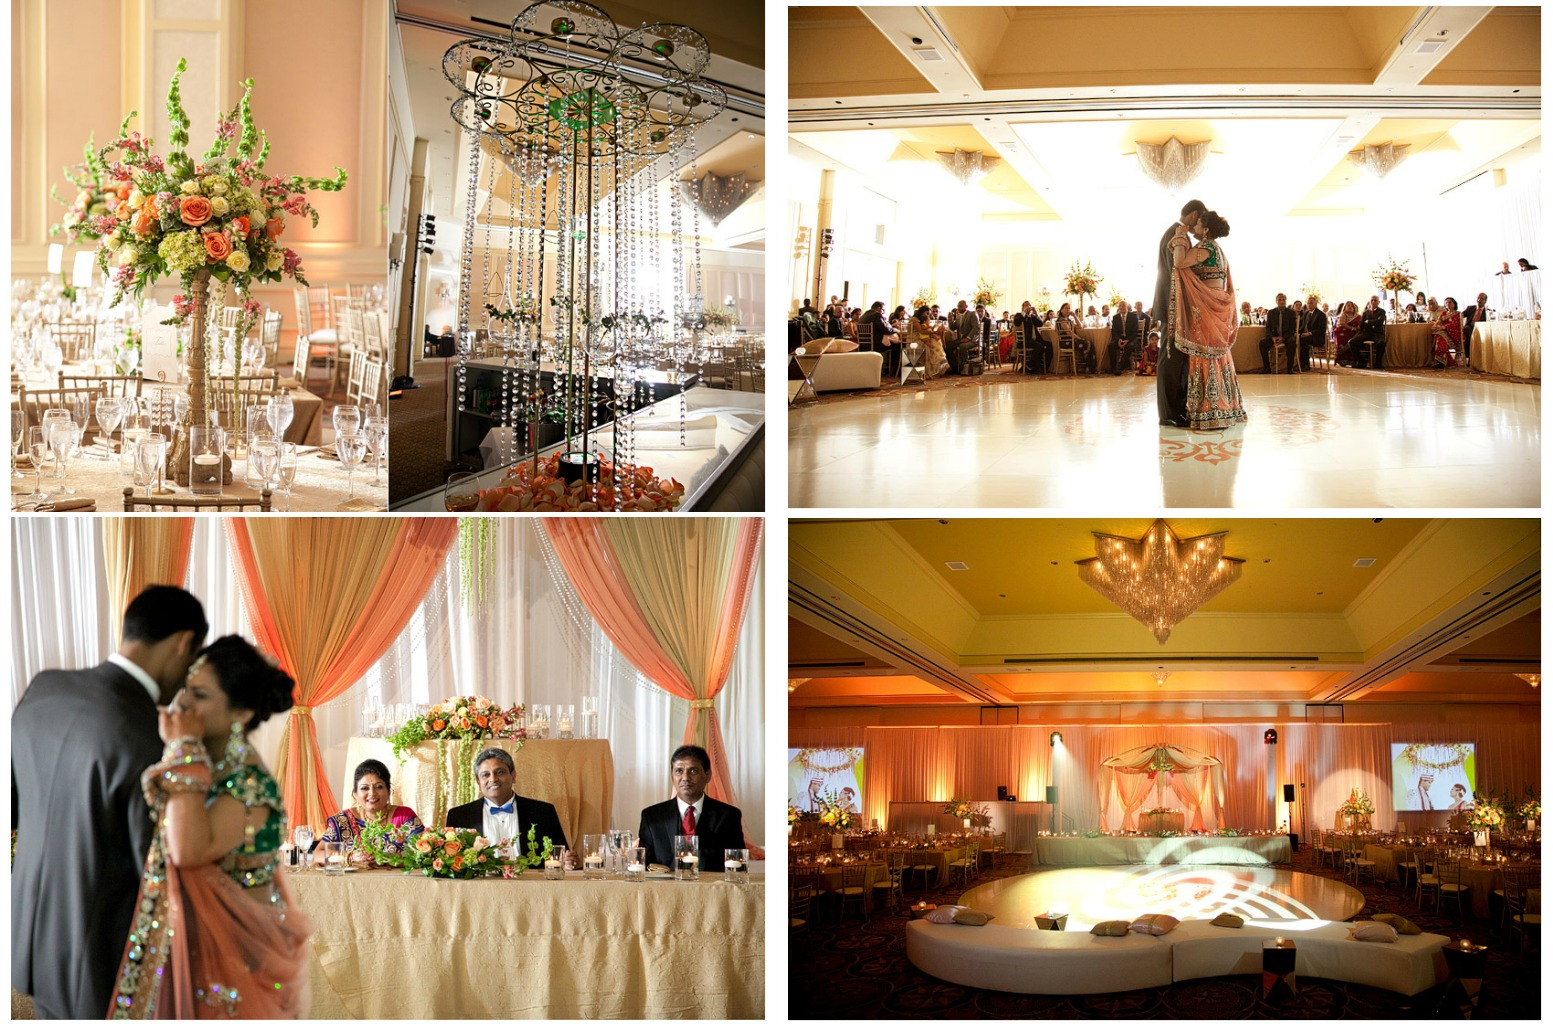 Buckhead Atlanta Indian Weddings Occasions by Shangri-la